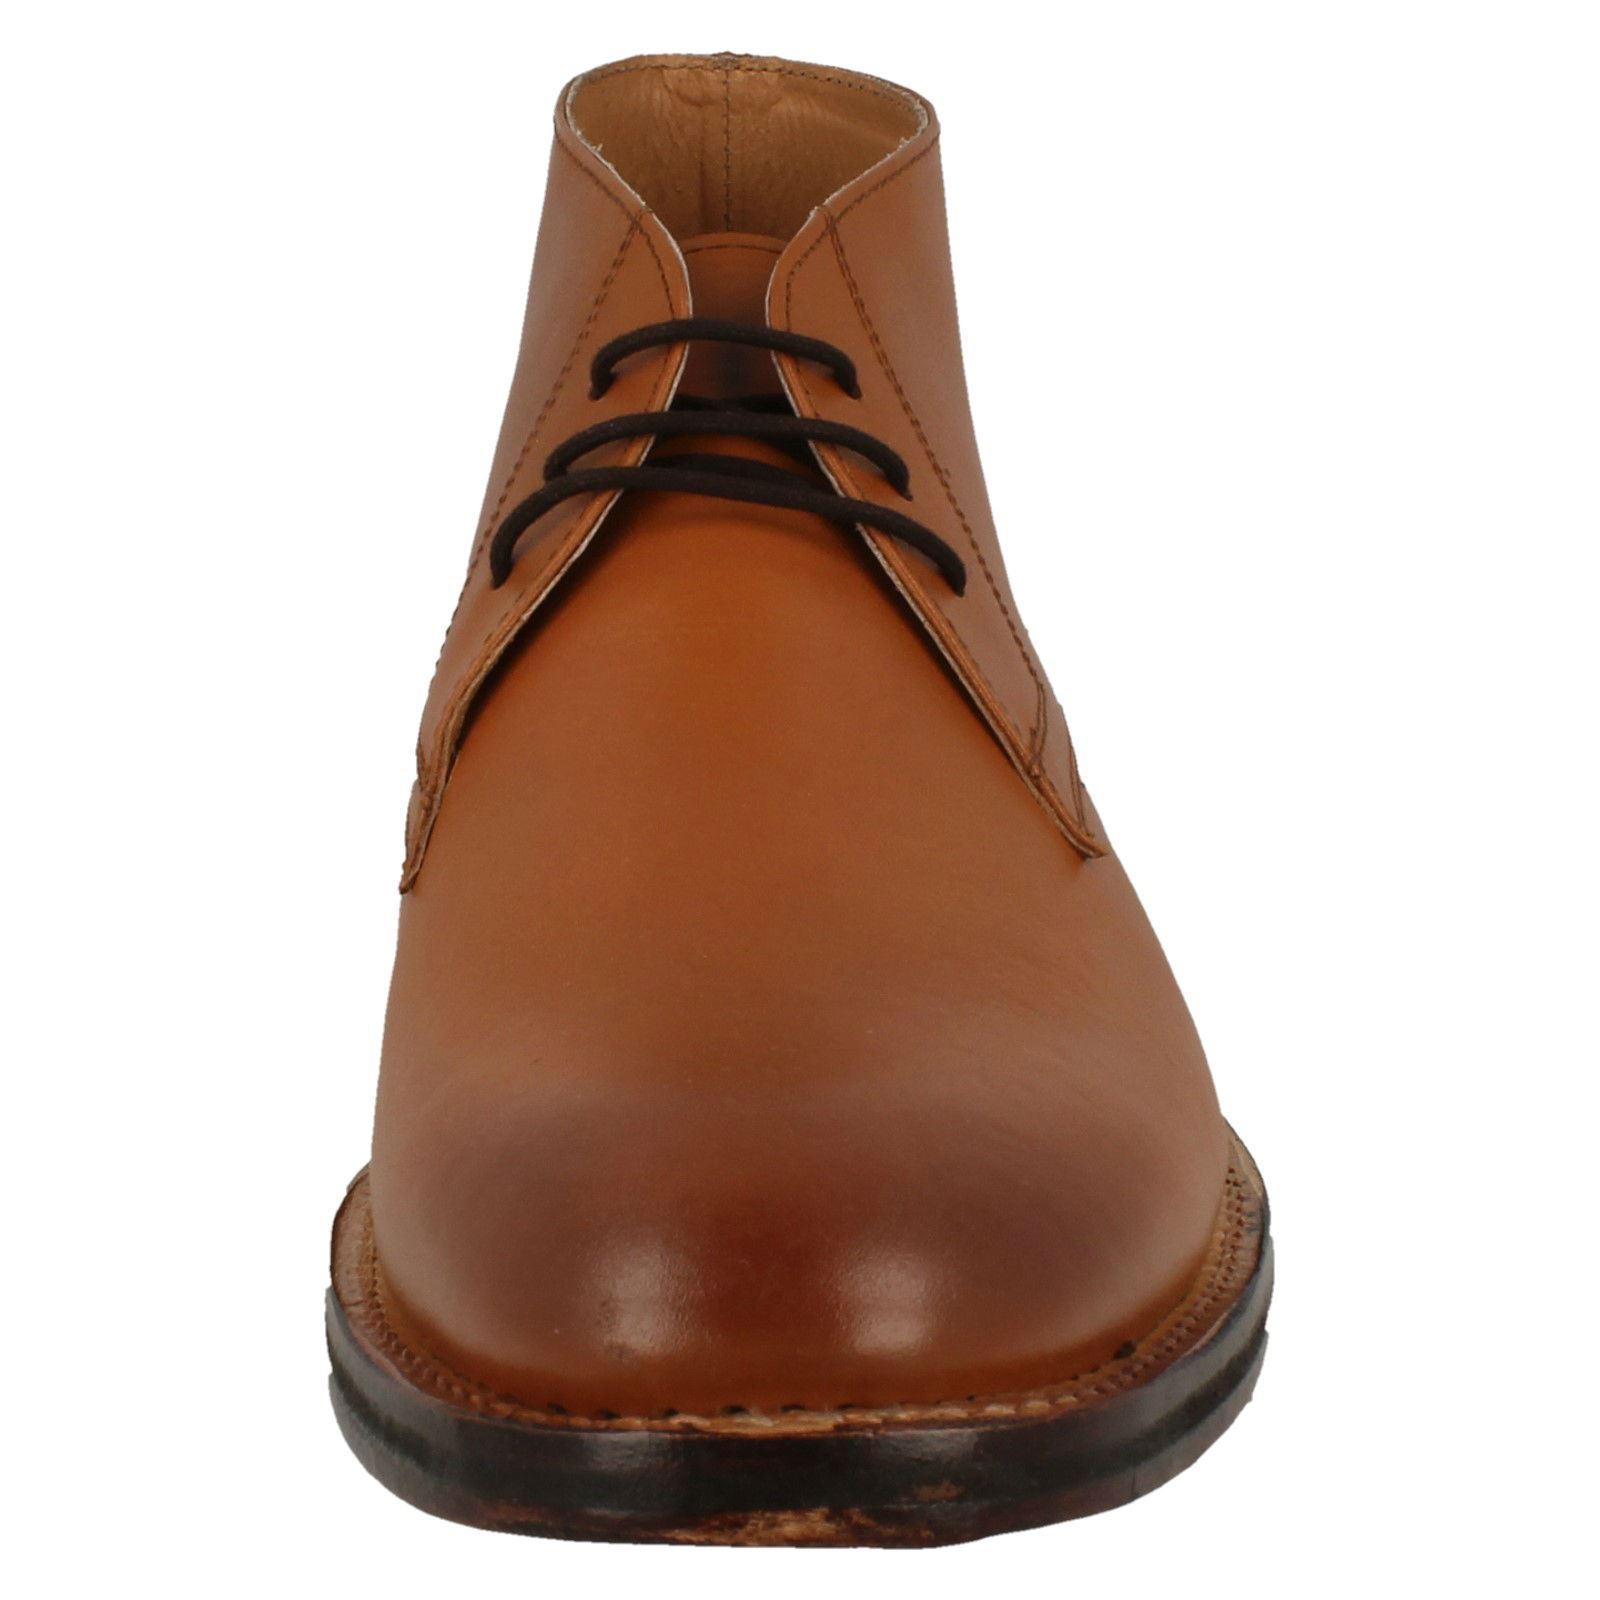 Mens-Catesby-Smart-Desert-Boot-MCW159T thumbnail 5